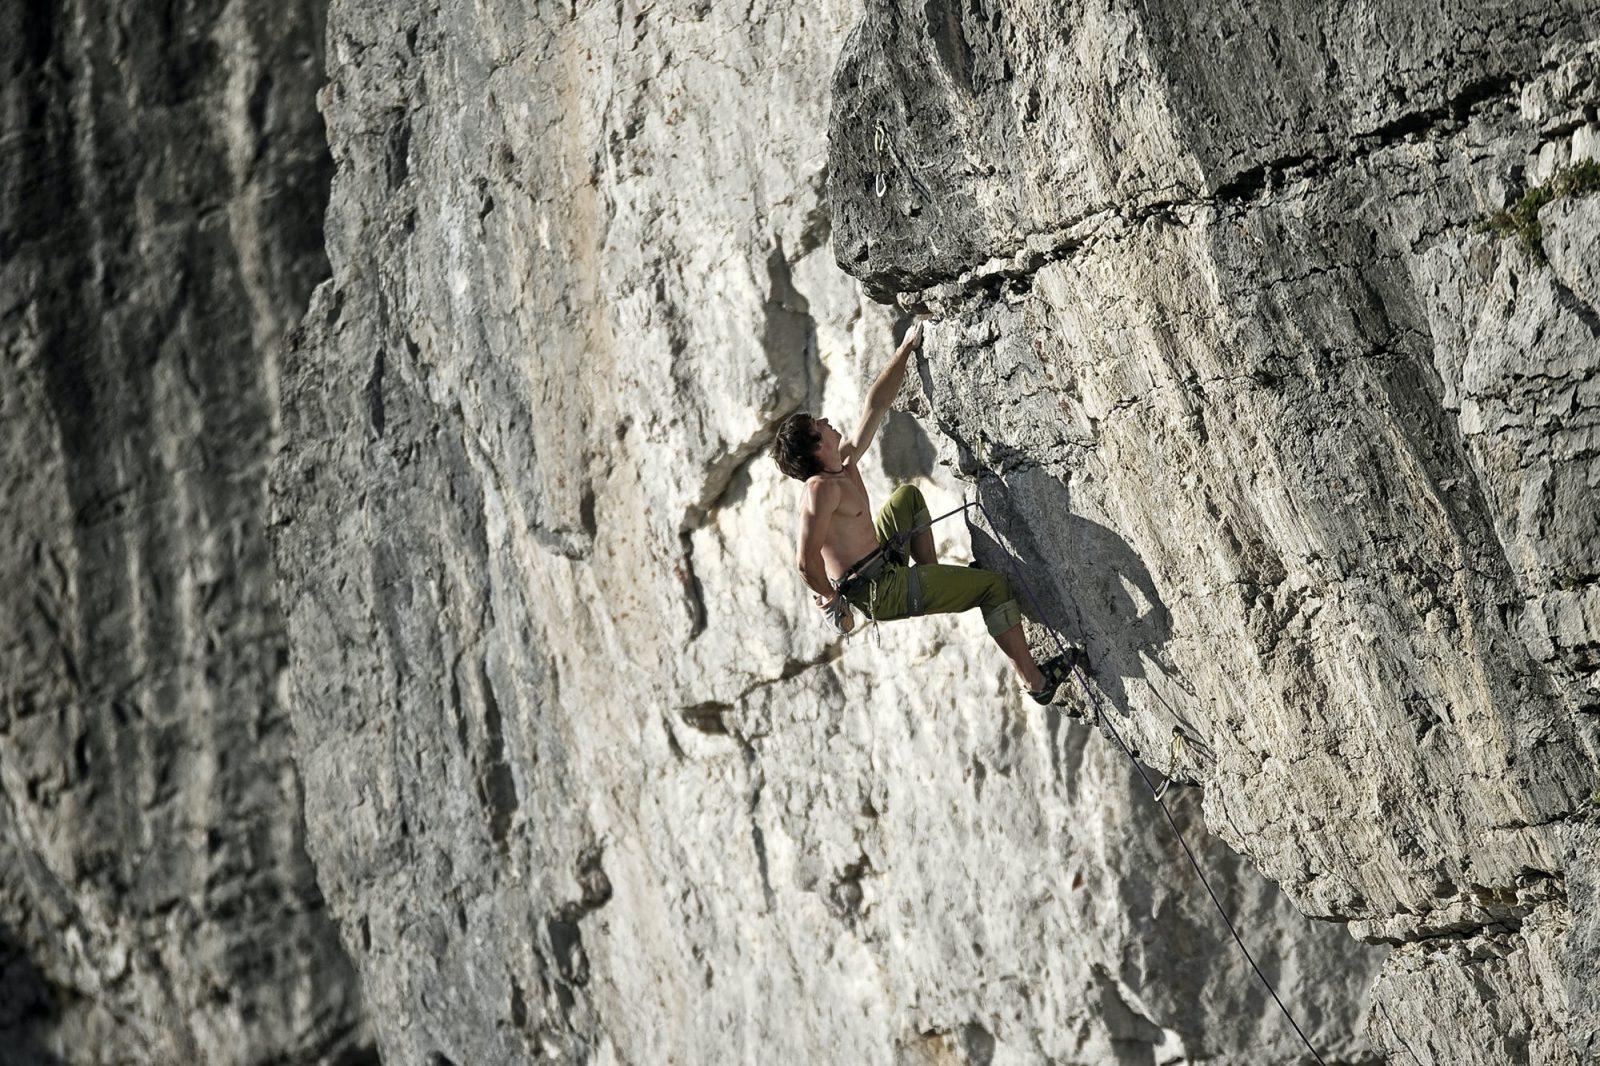 Klettern an der Steinplatte Waidring, Fito: Region Steinberge |Climbers Paradise